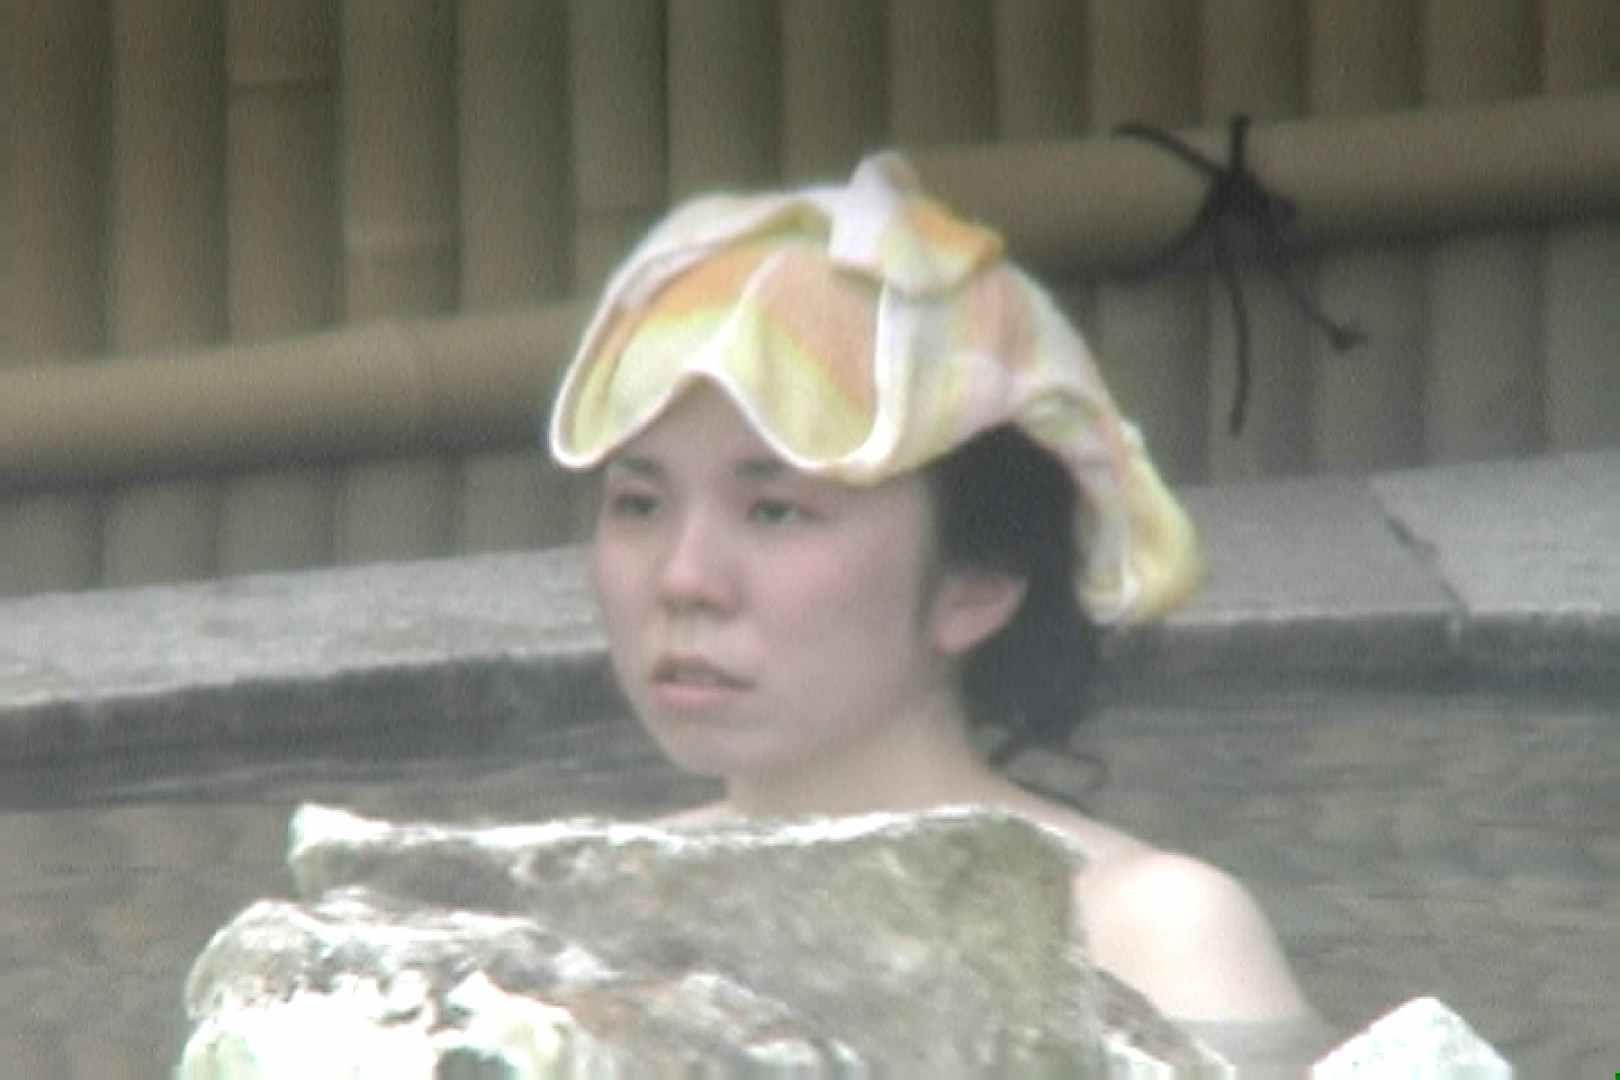 Aquaな露天風呂Vol.687 盗撮   OLセックス  63画像 40